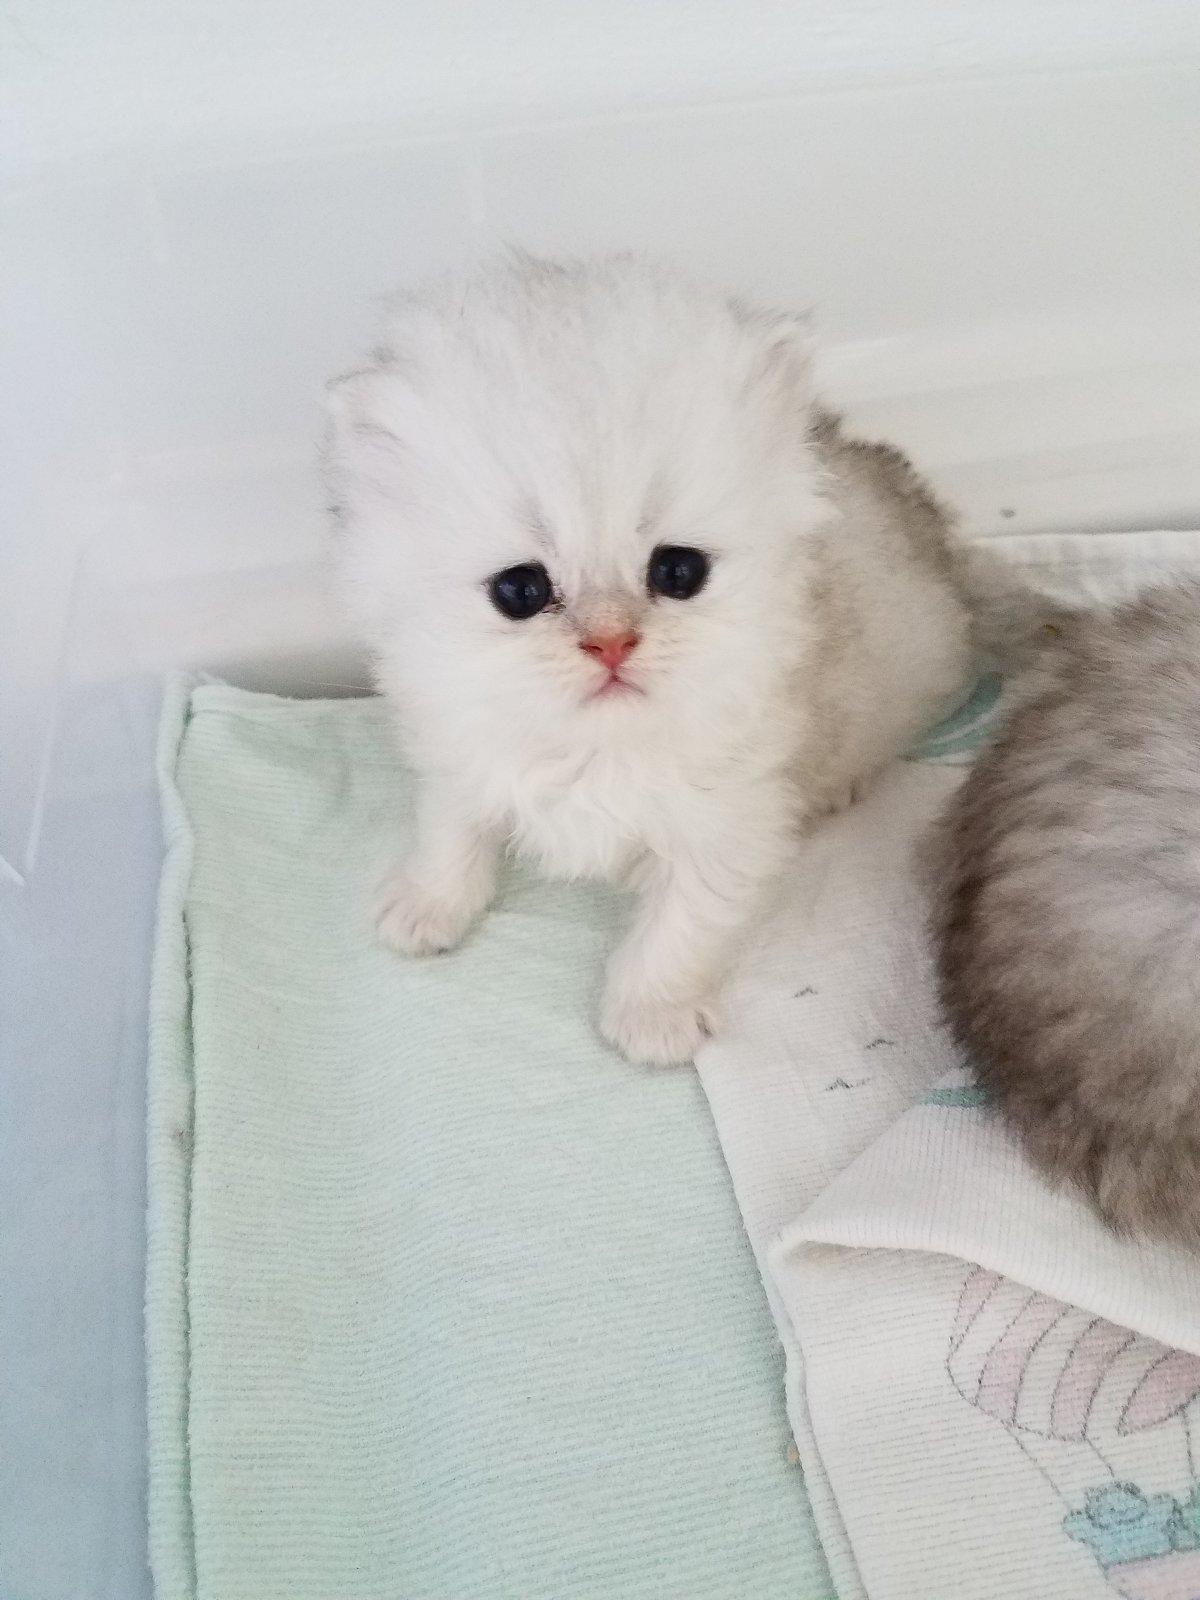 Doll face Persian kittens | in St Helens, Merseyside | Gumtree |Baby Doll Face Kittens